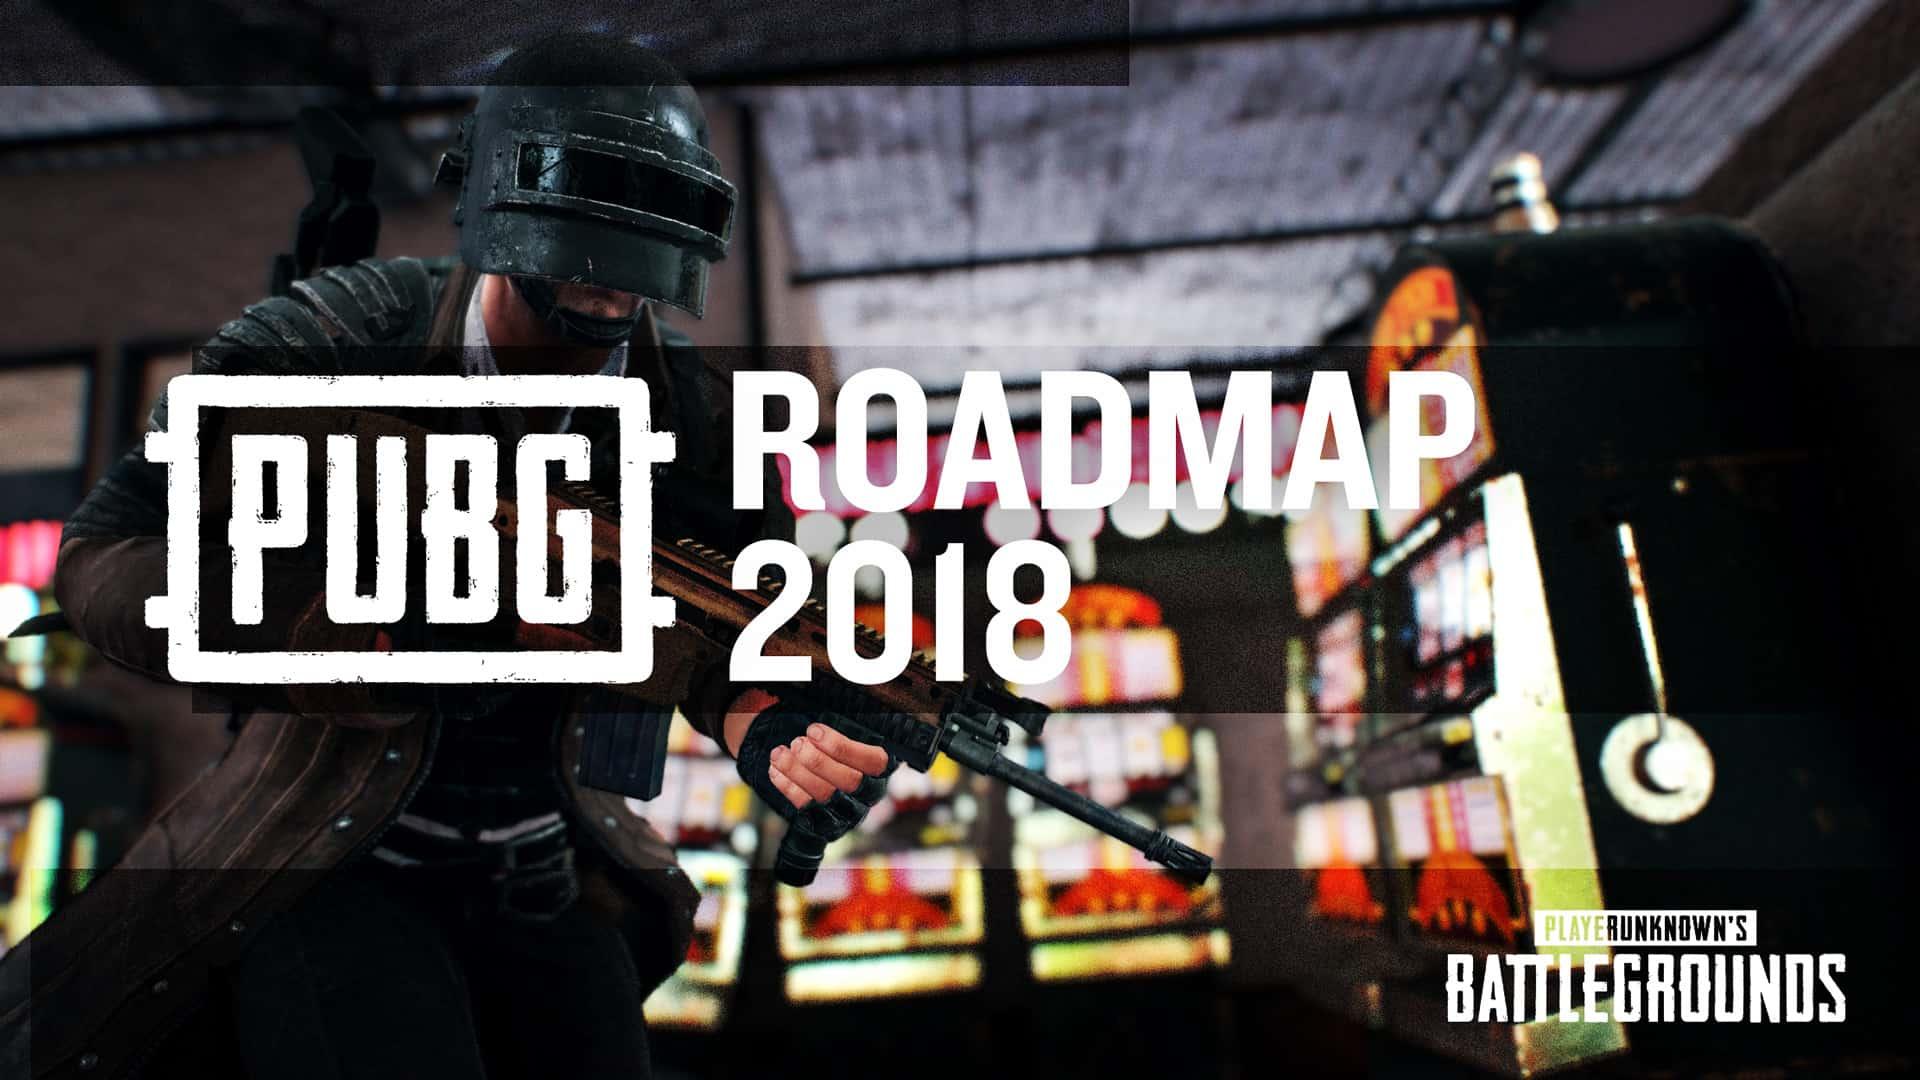 pubg roadmap 2018